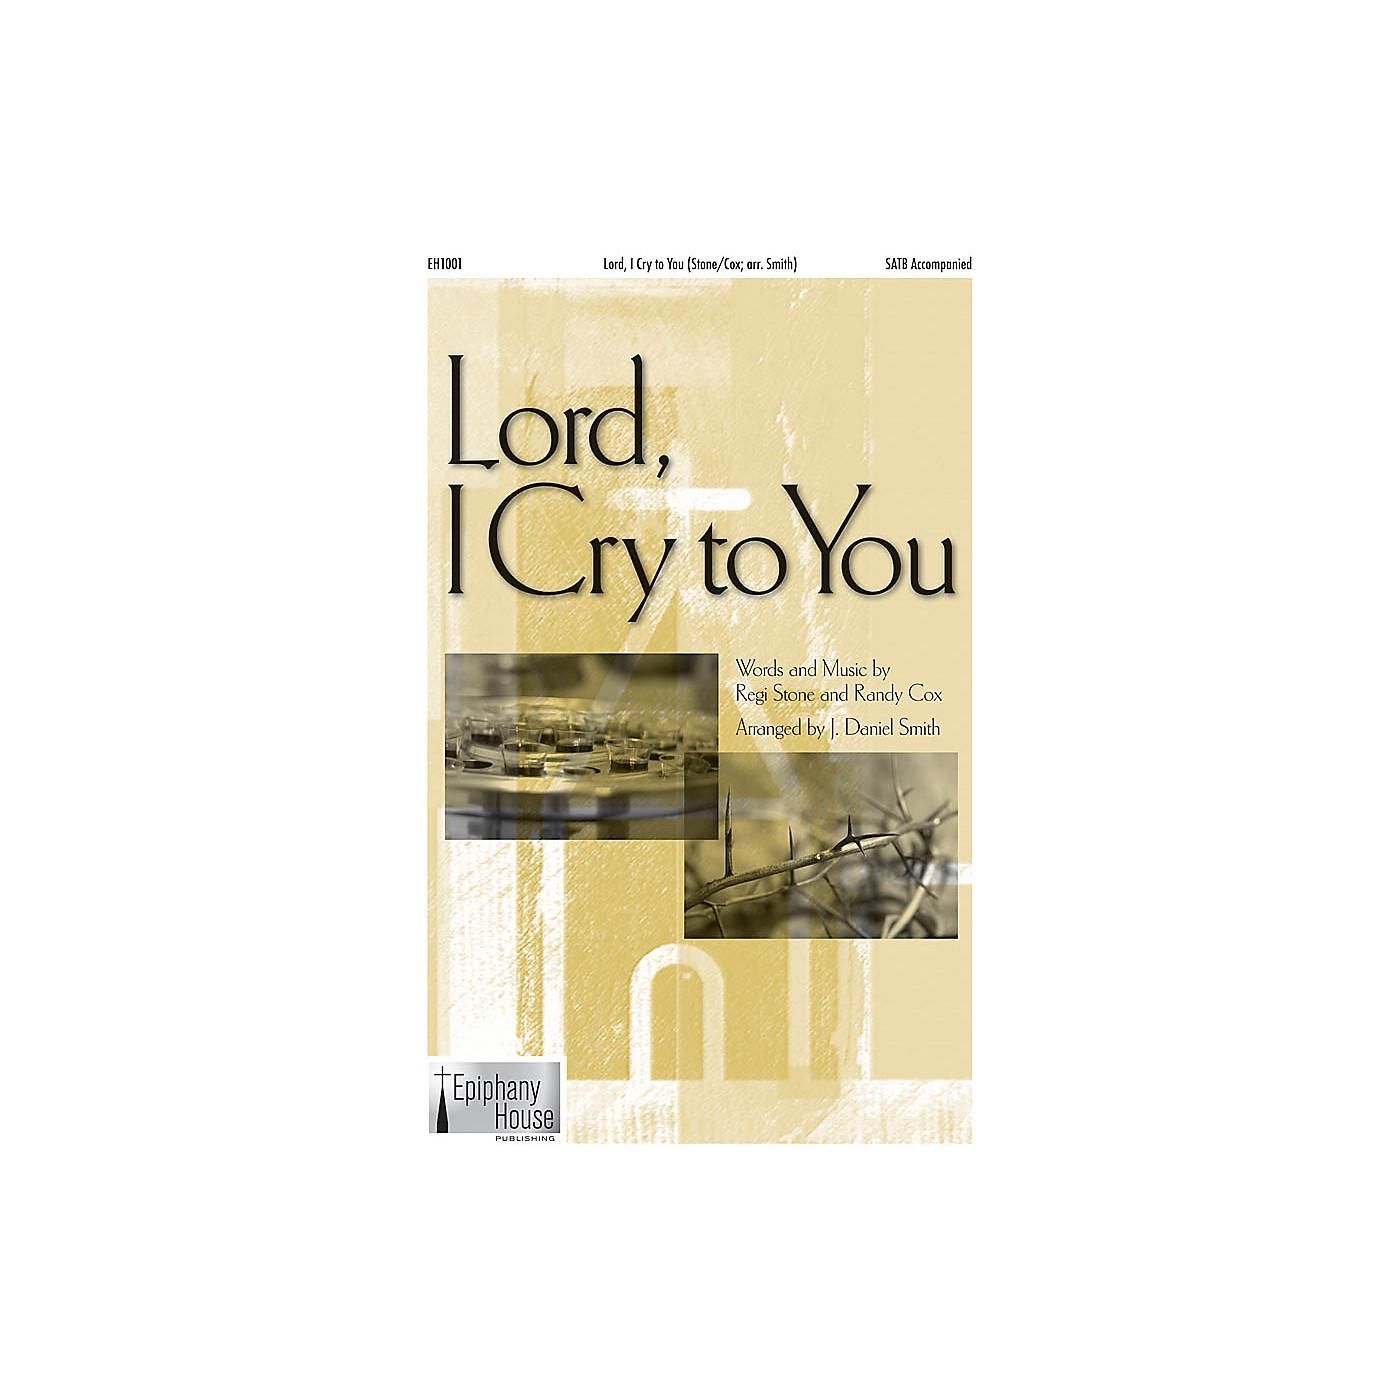 Epiphany House Publishing Lord, I Cry to You CD ACCOMP Arranged by J. Daniel Smith thumbnail